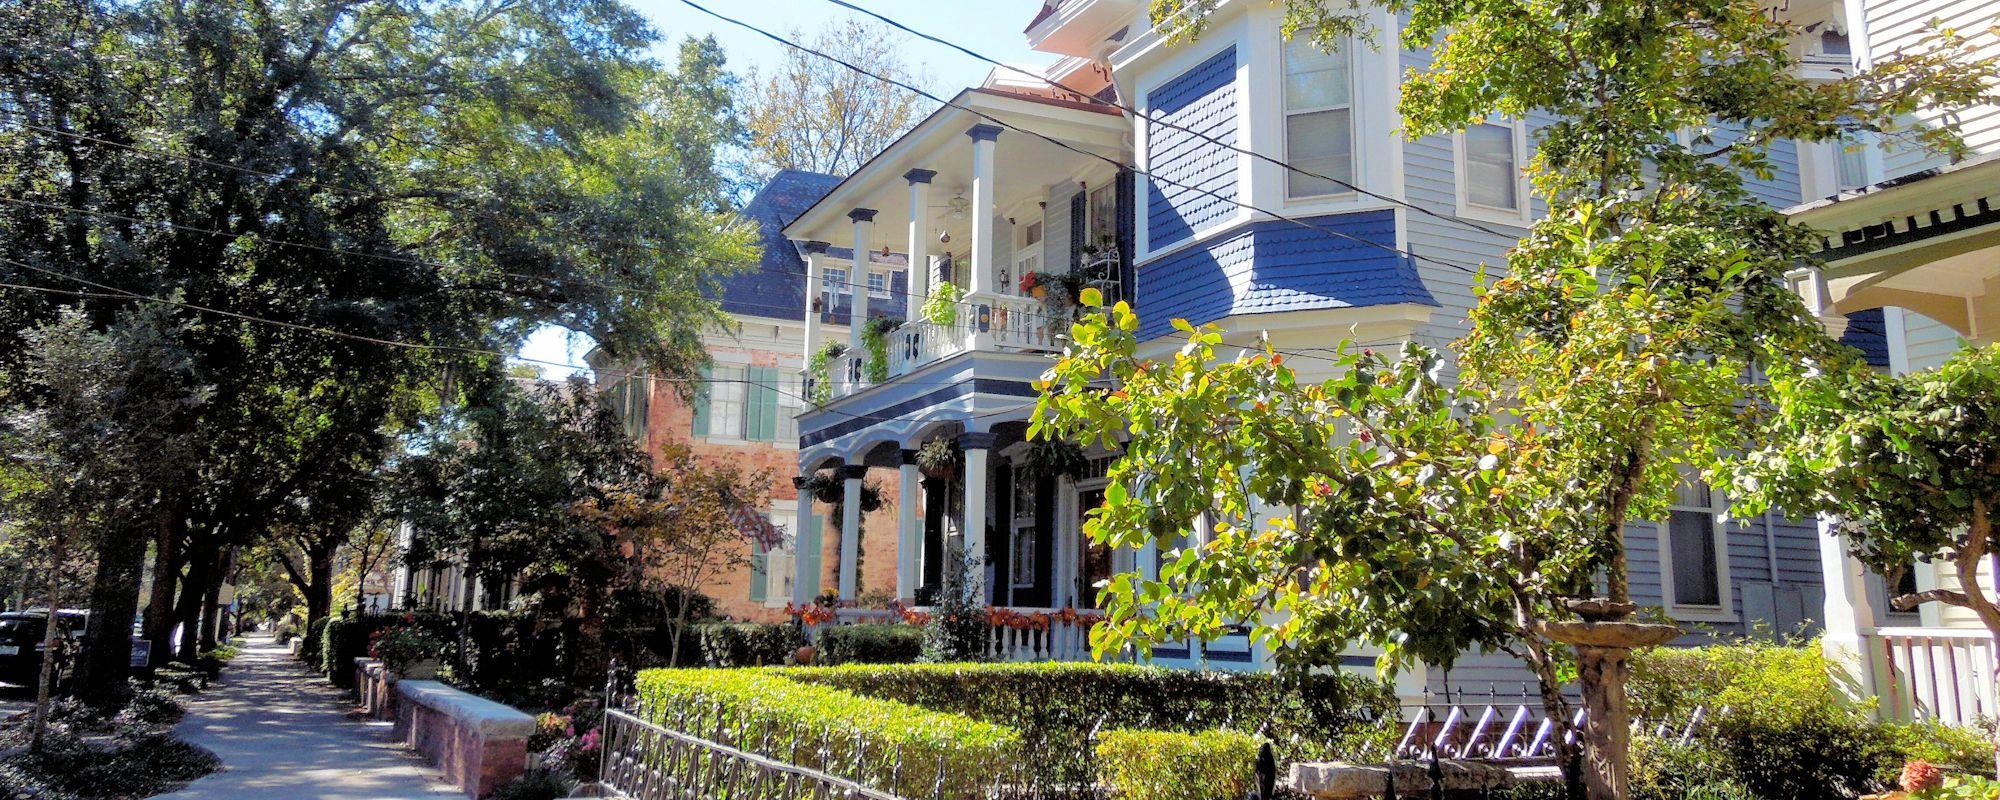 Luxury Neighborhoods - Communities - Historic District